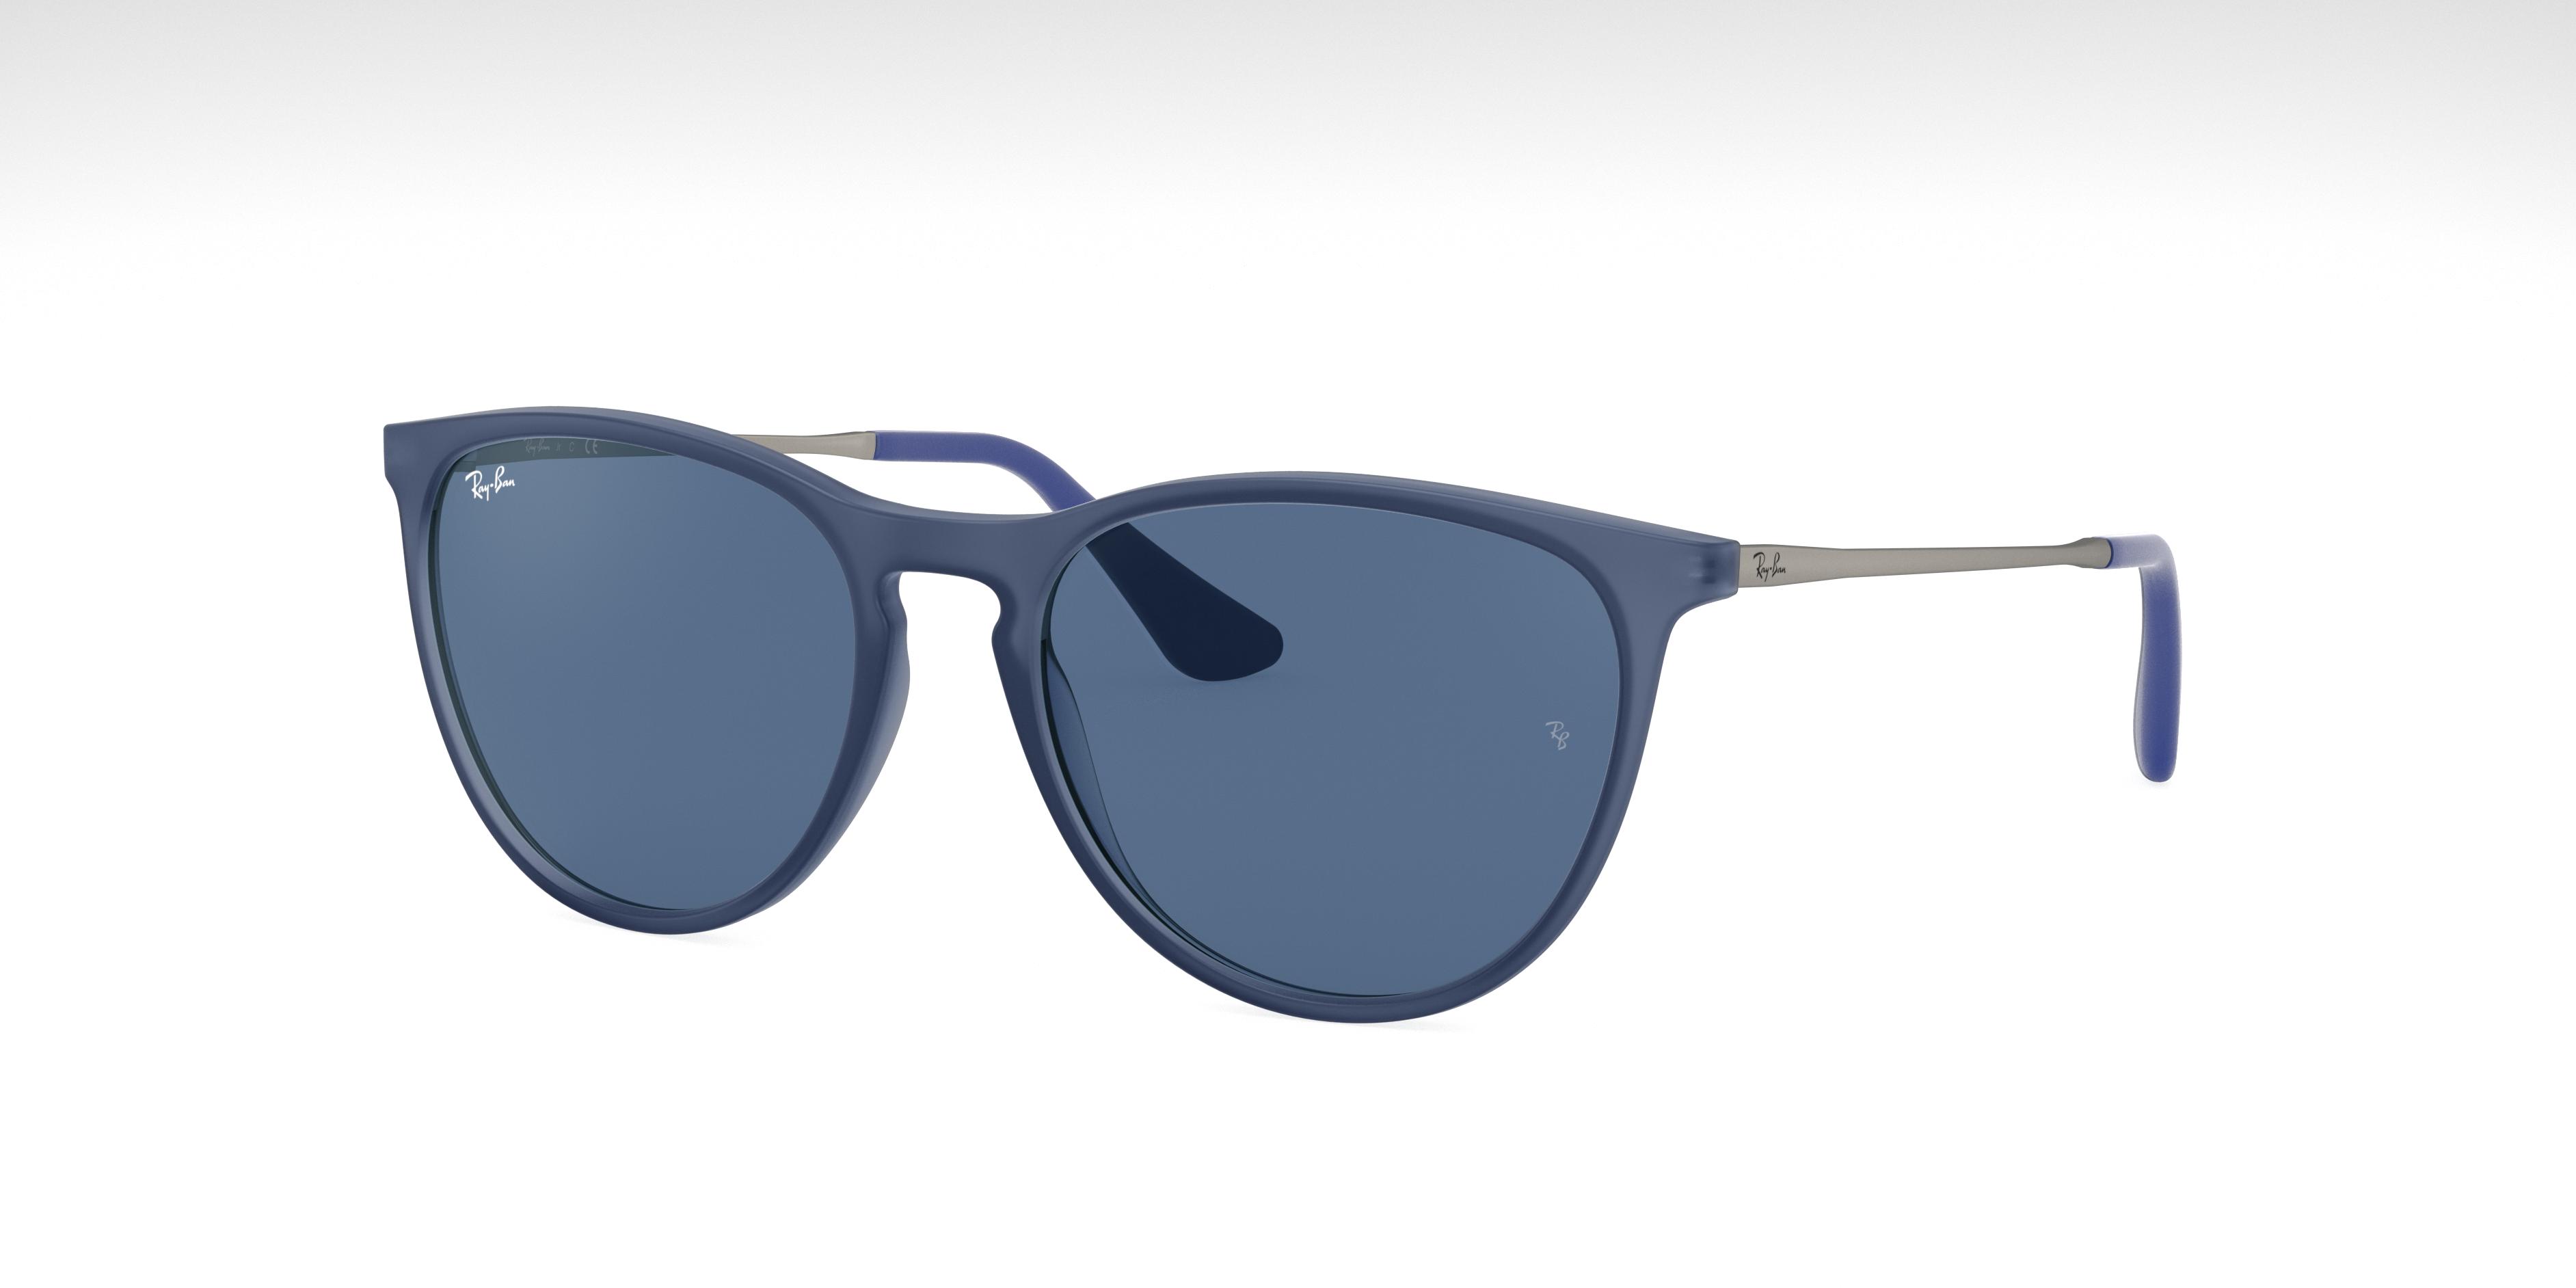 Ray-Ban Izzy Rubber Silver, Blue Lenses - RJ9060S